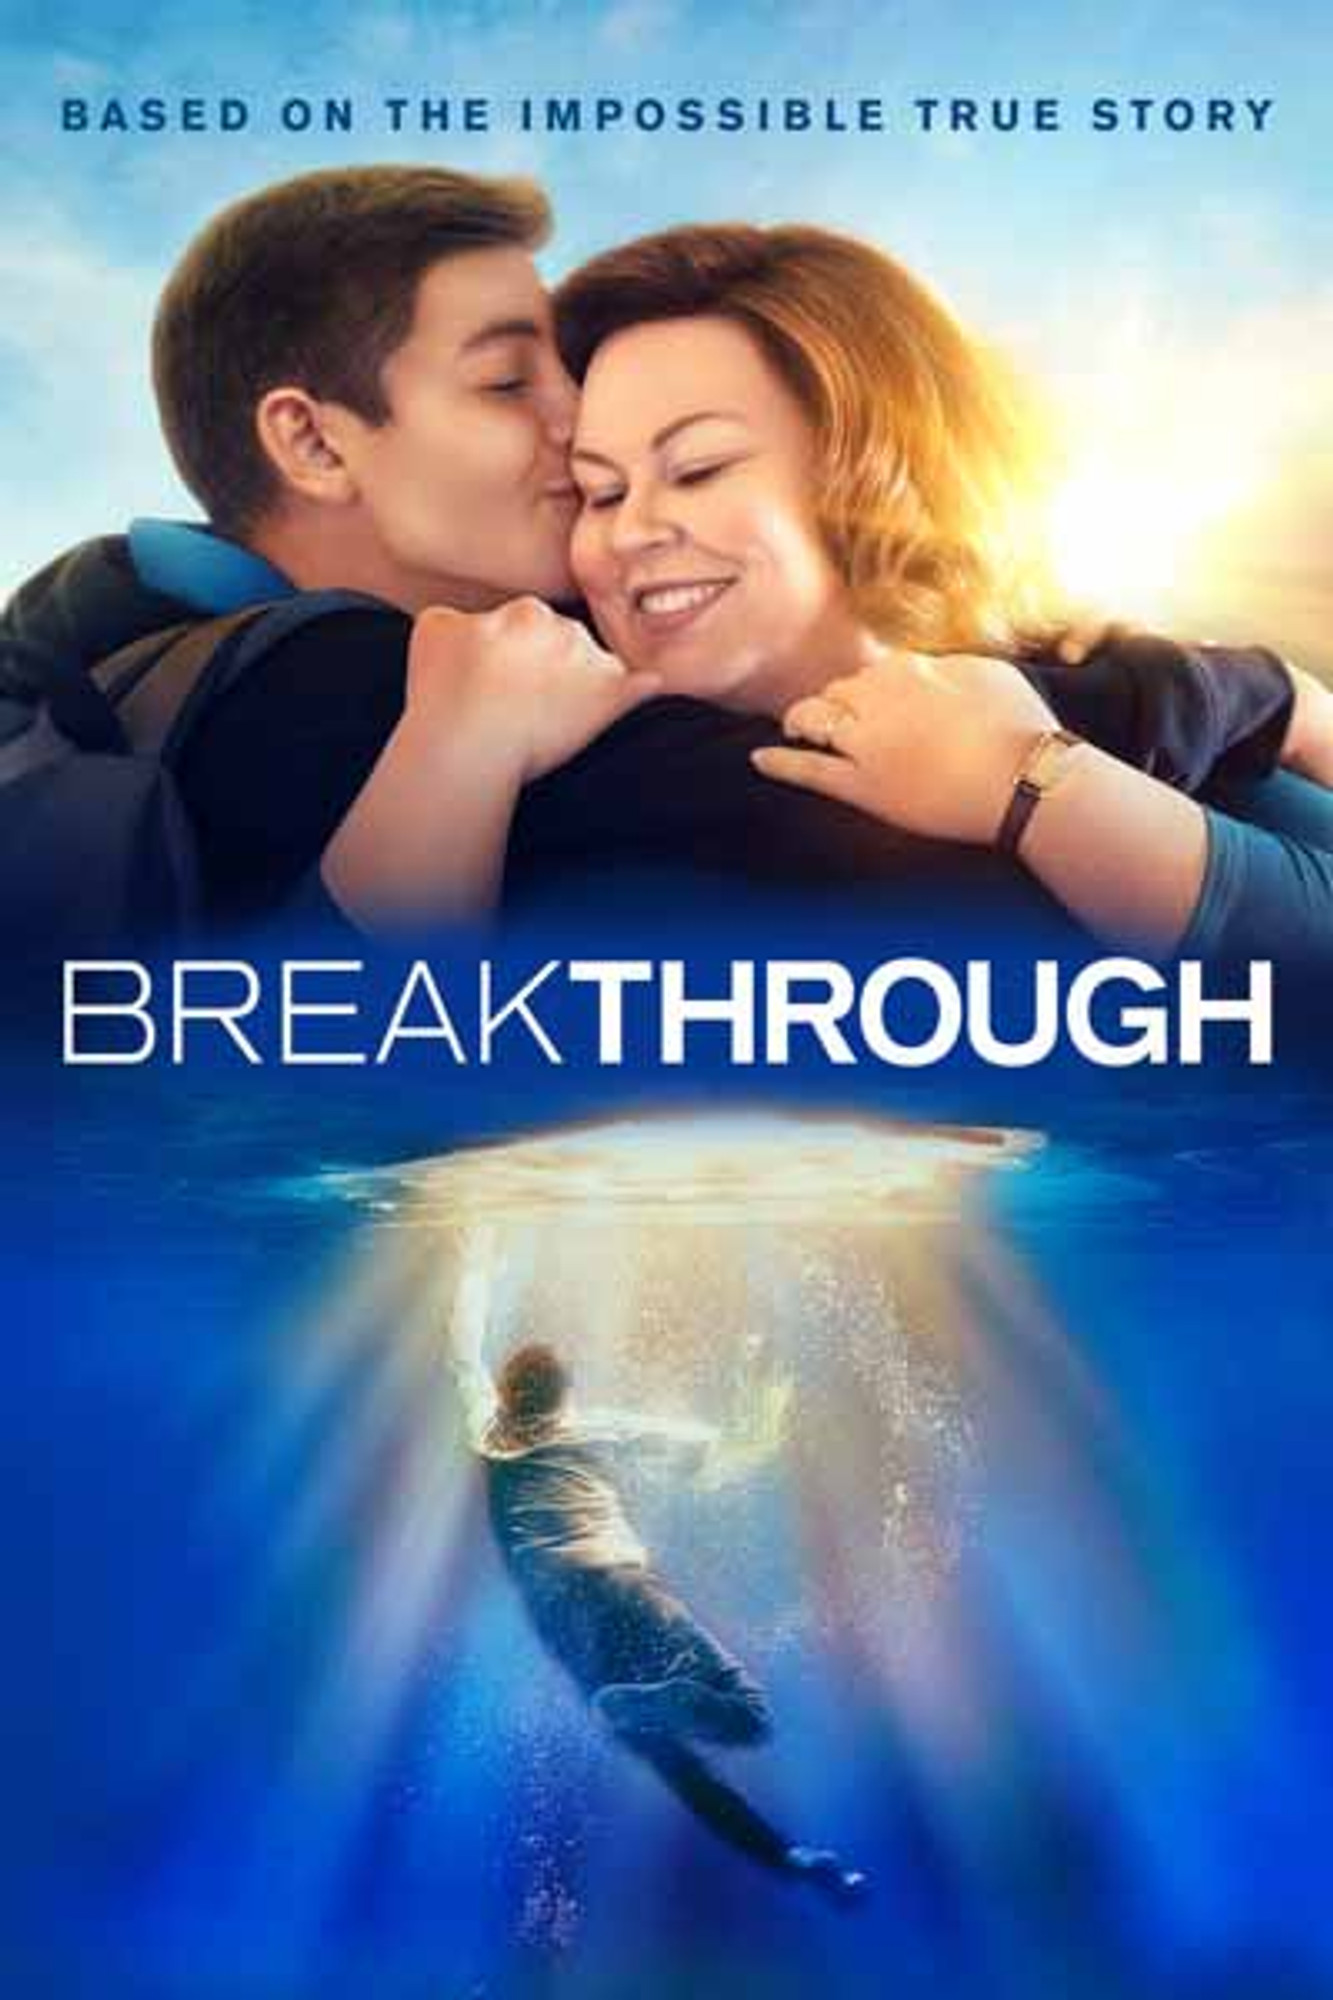 Breakthrough [Movies Anywhere HD, Vudu HD or iTunes HD via Movies Anywhere]